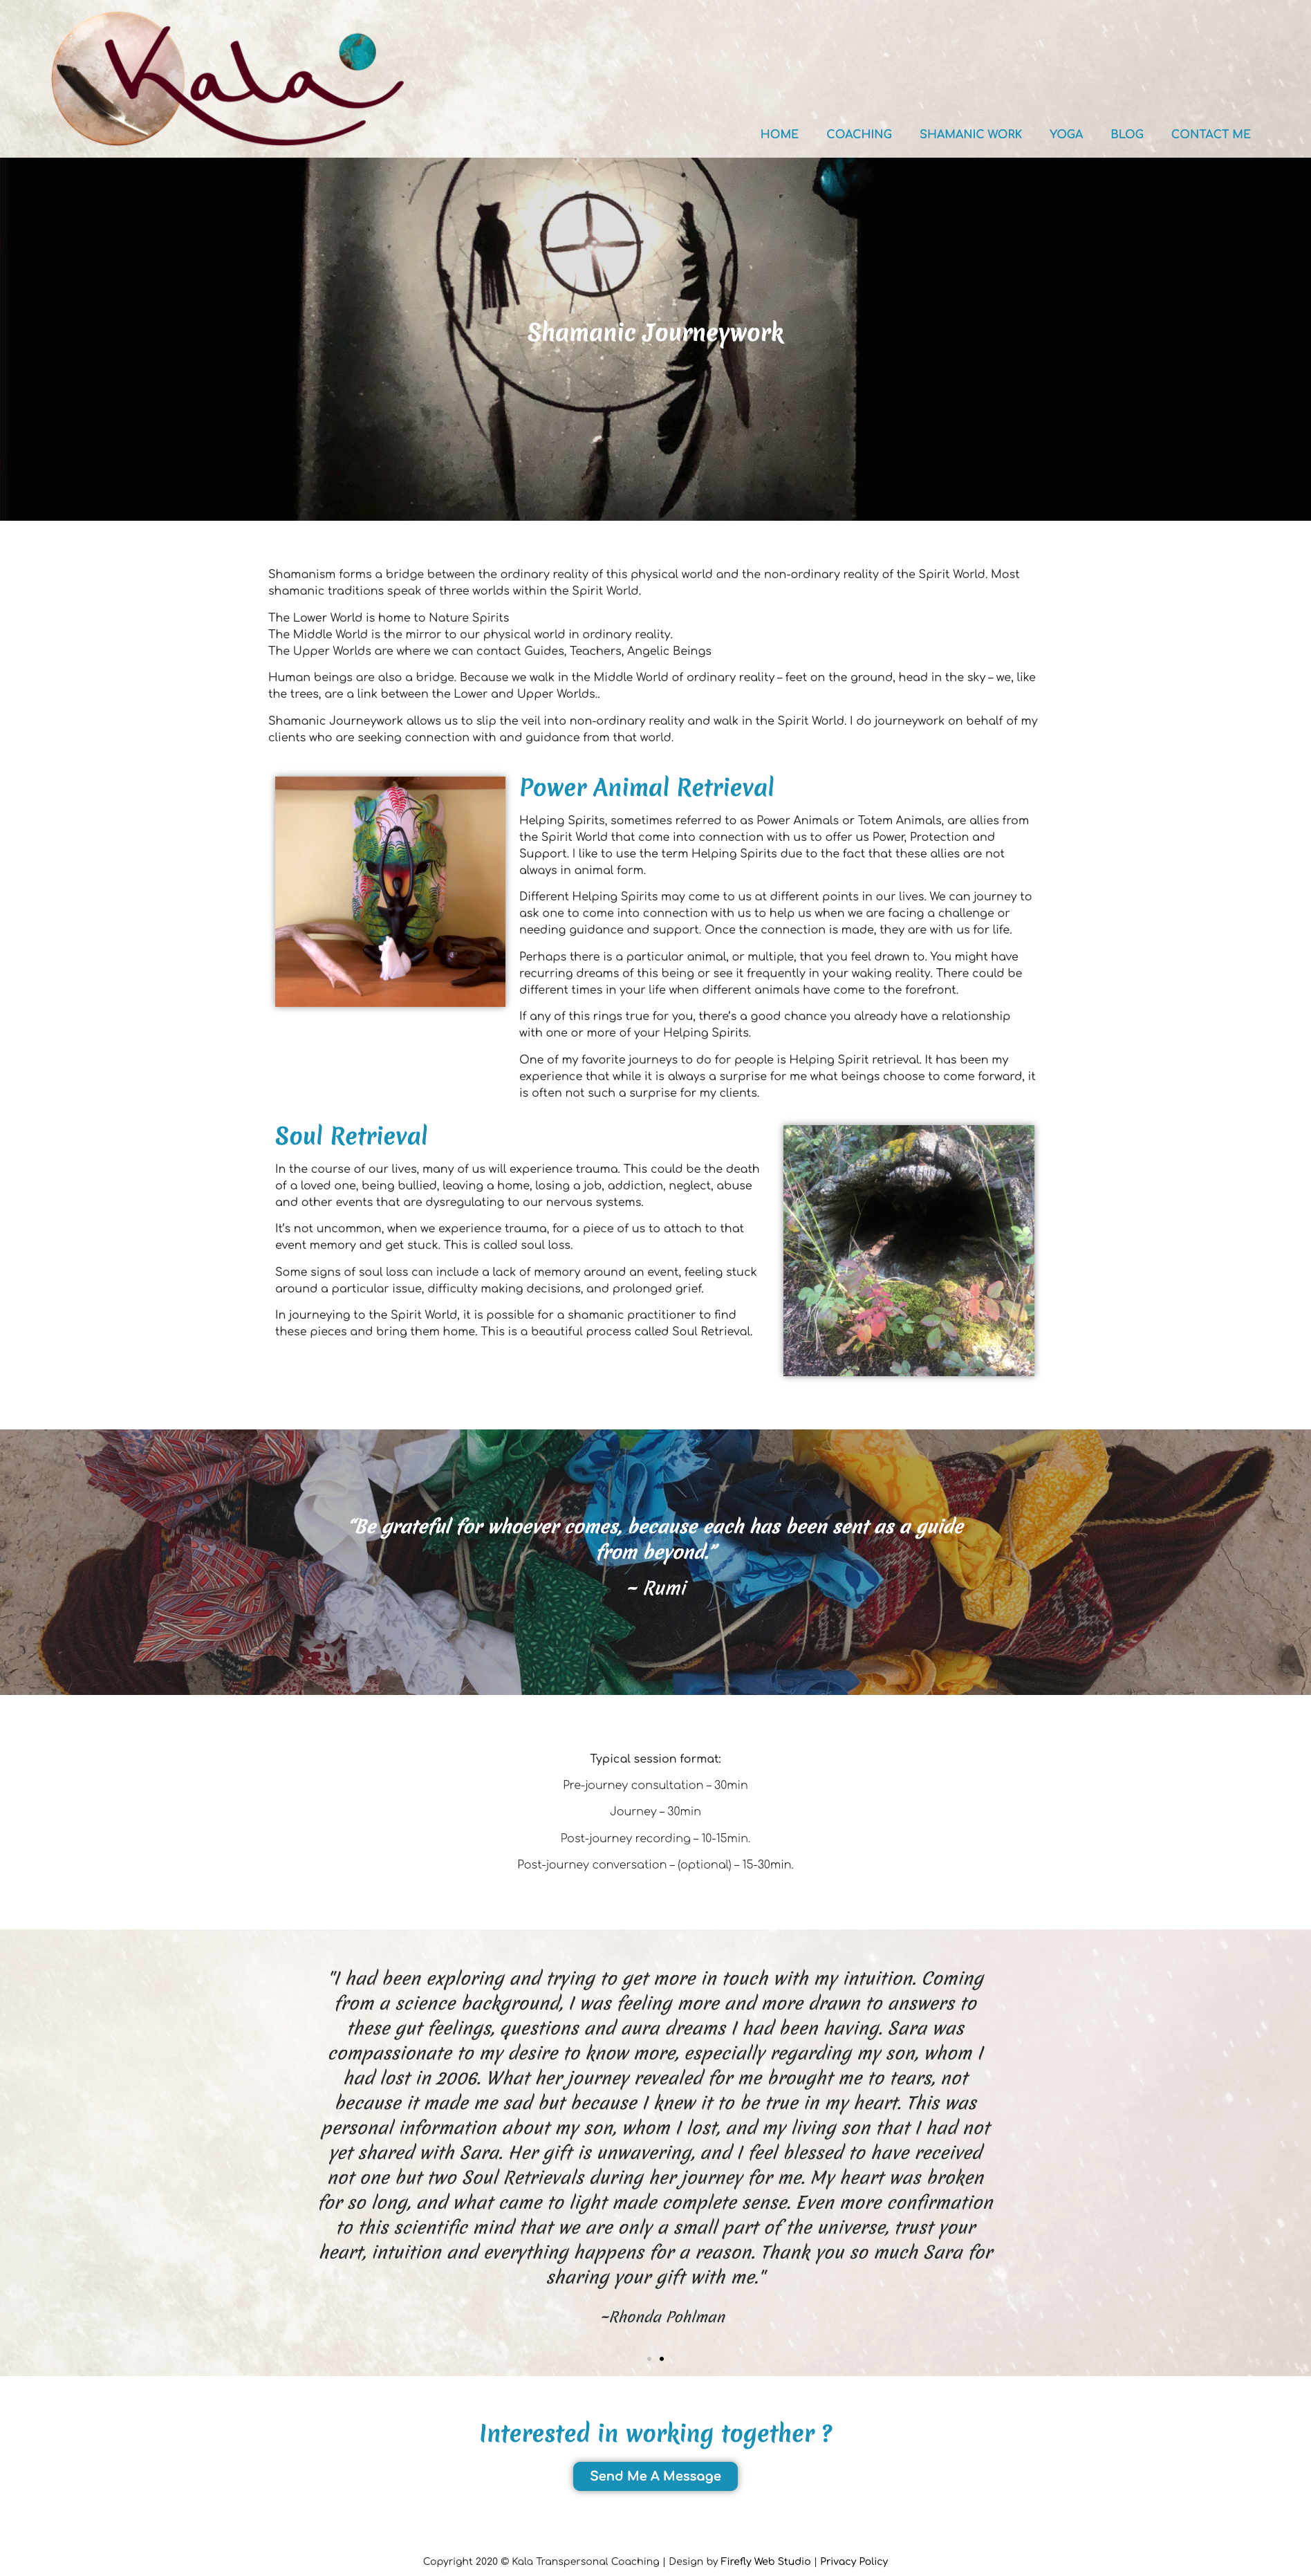 shamanic work page for kala transpersonal coaching